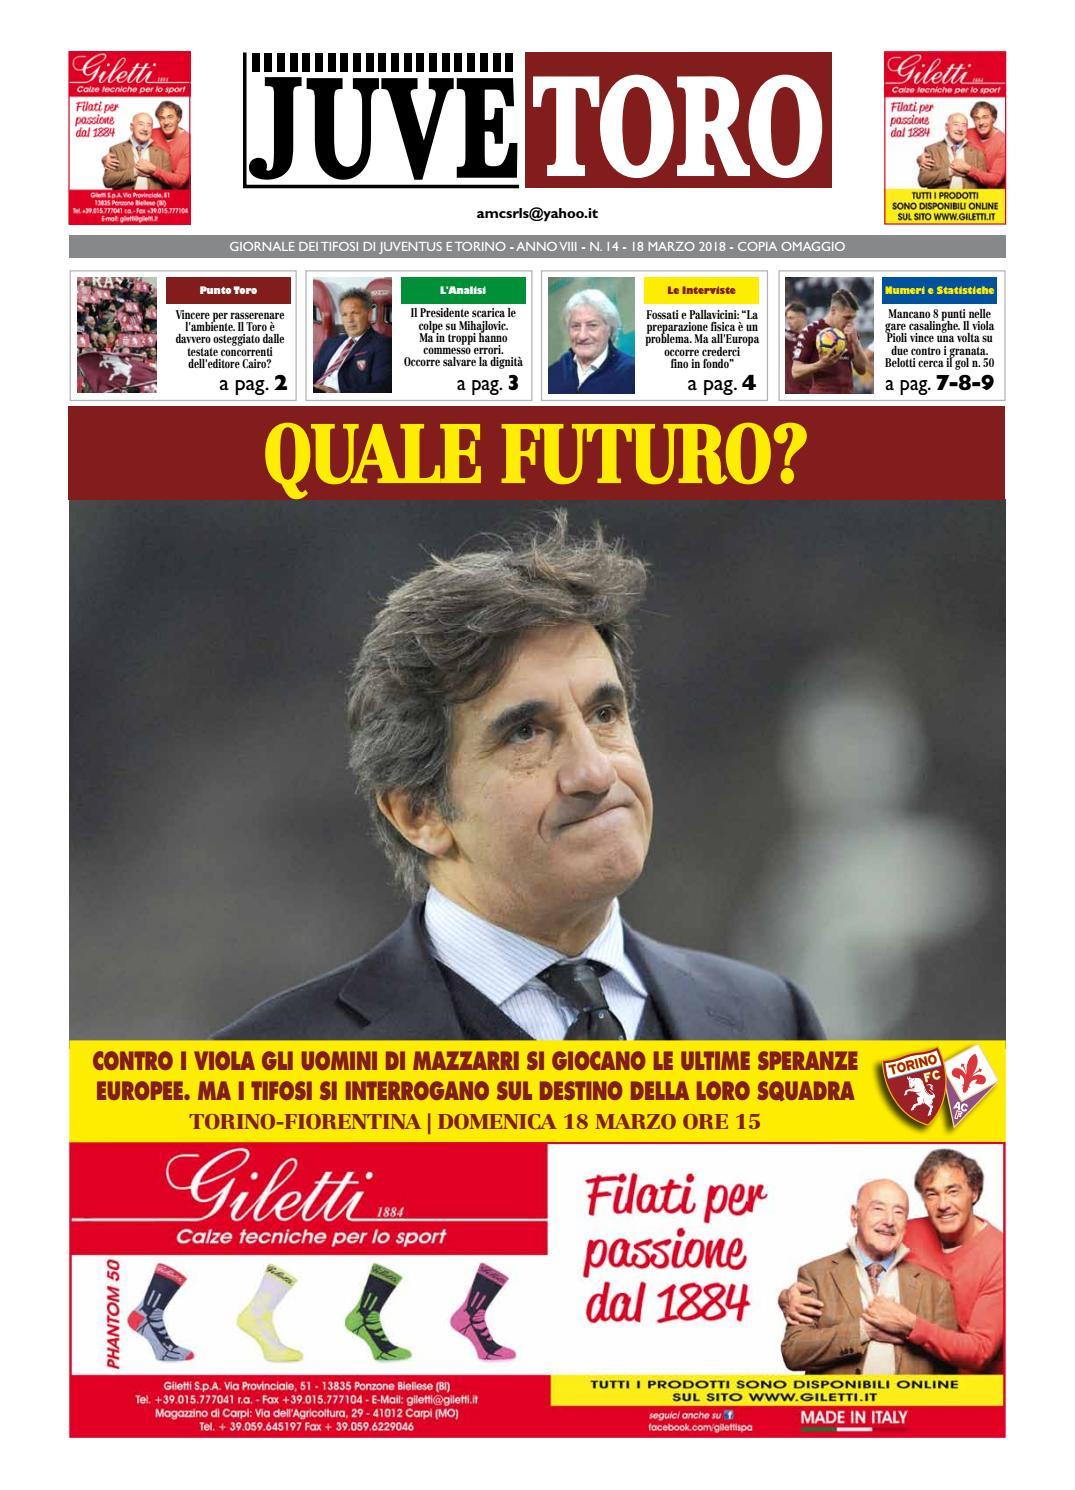 0fdab55c9 JuveToro n. 14 - anno VIII - Torino-Fiorentina by amcsrls - issuu